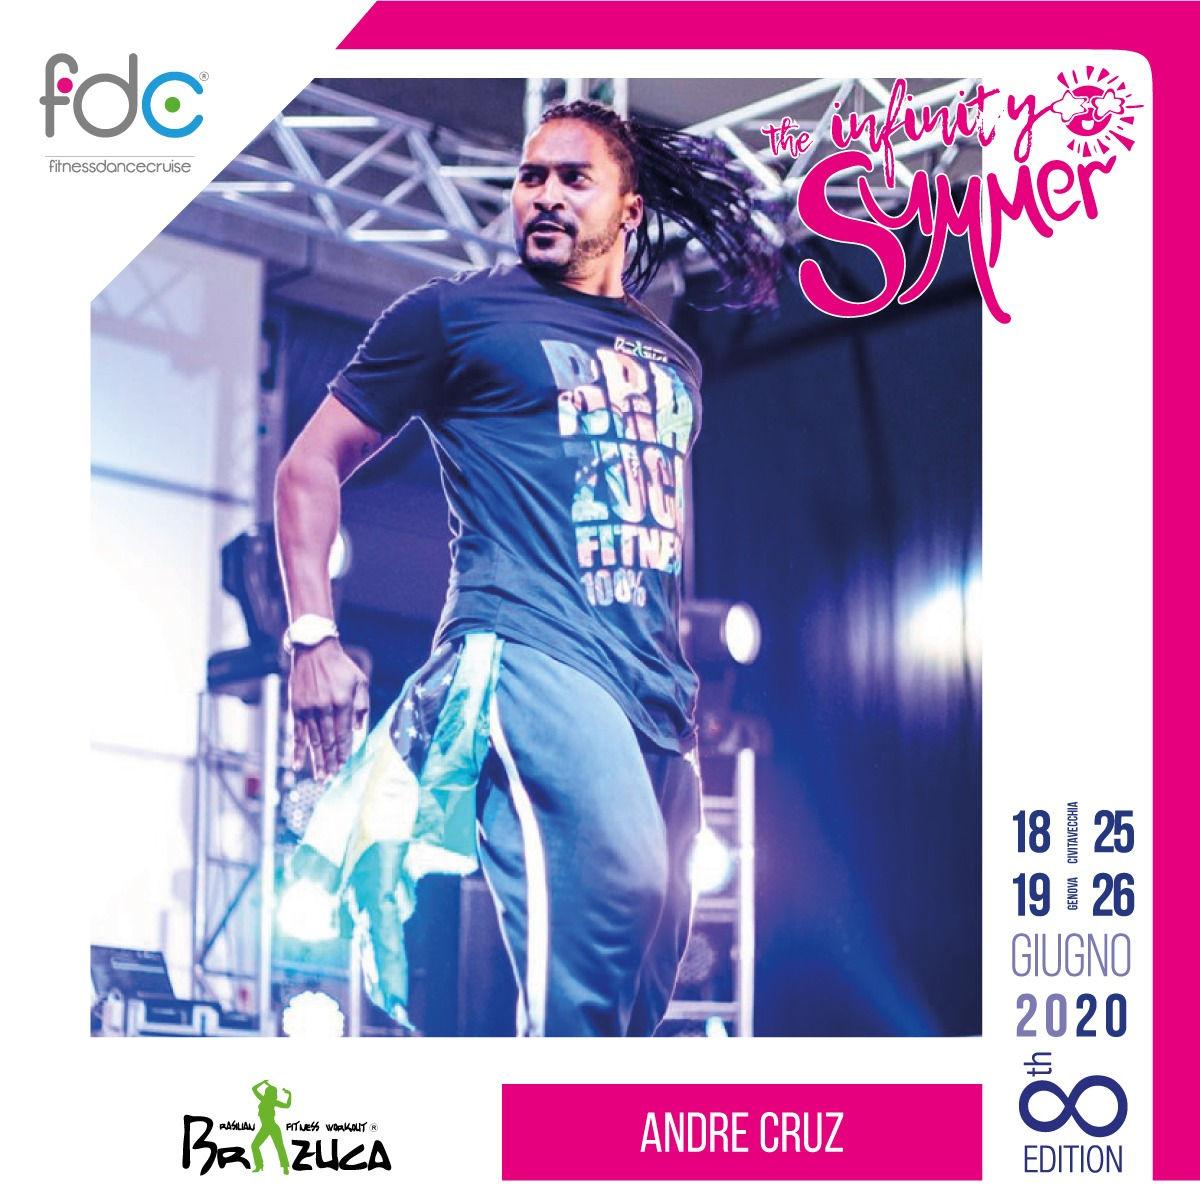 Brazuca FDC Presenter Andre Cruz